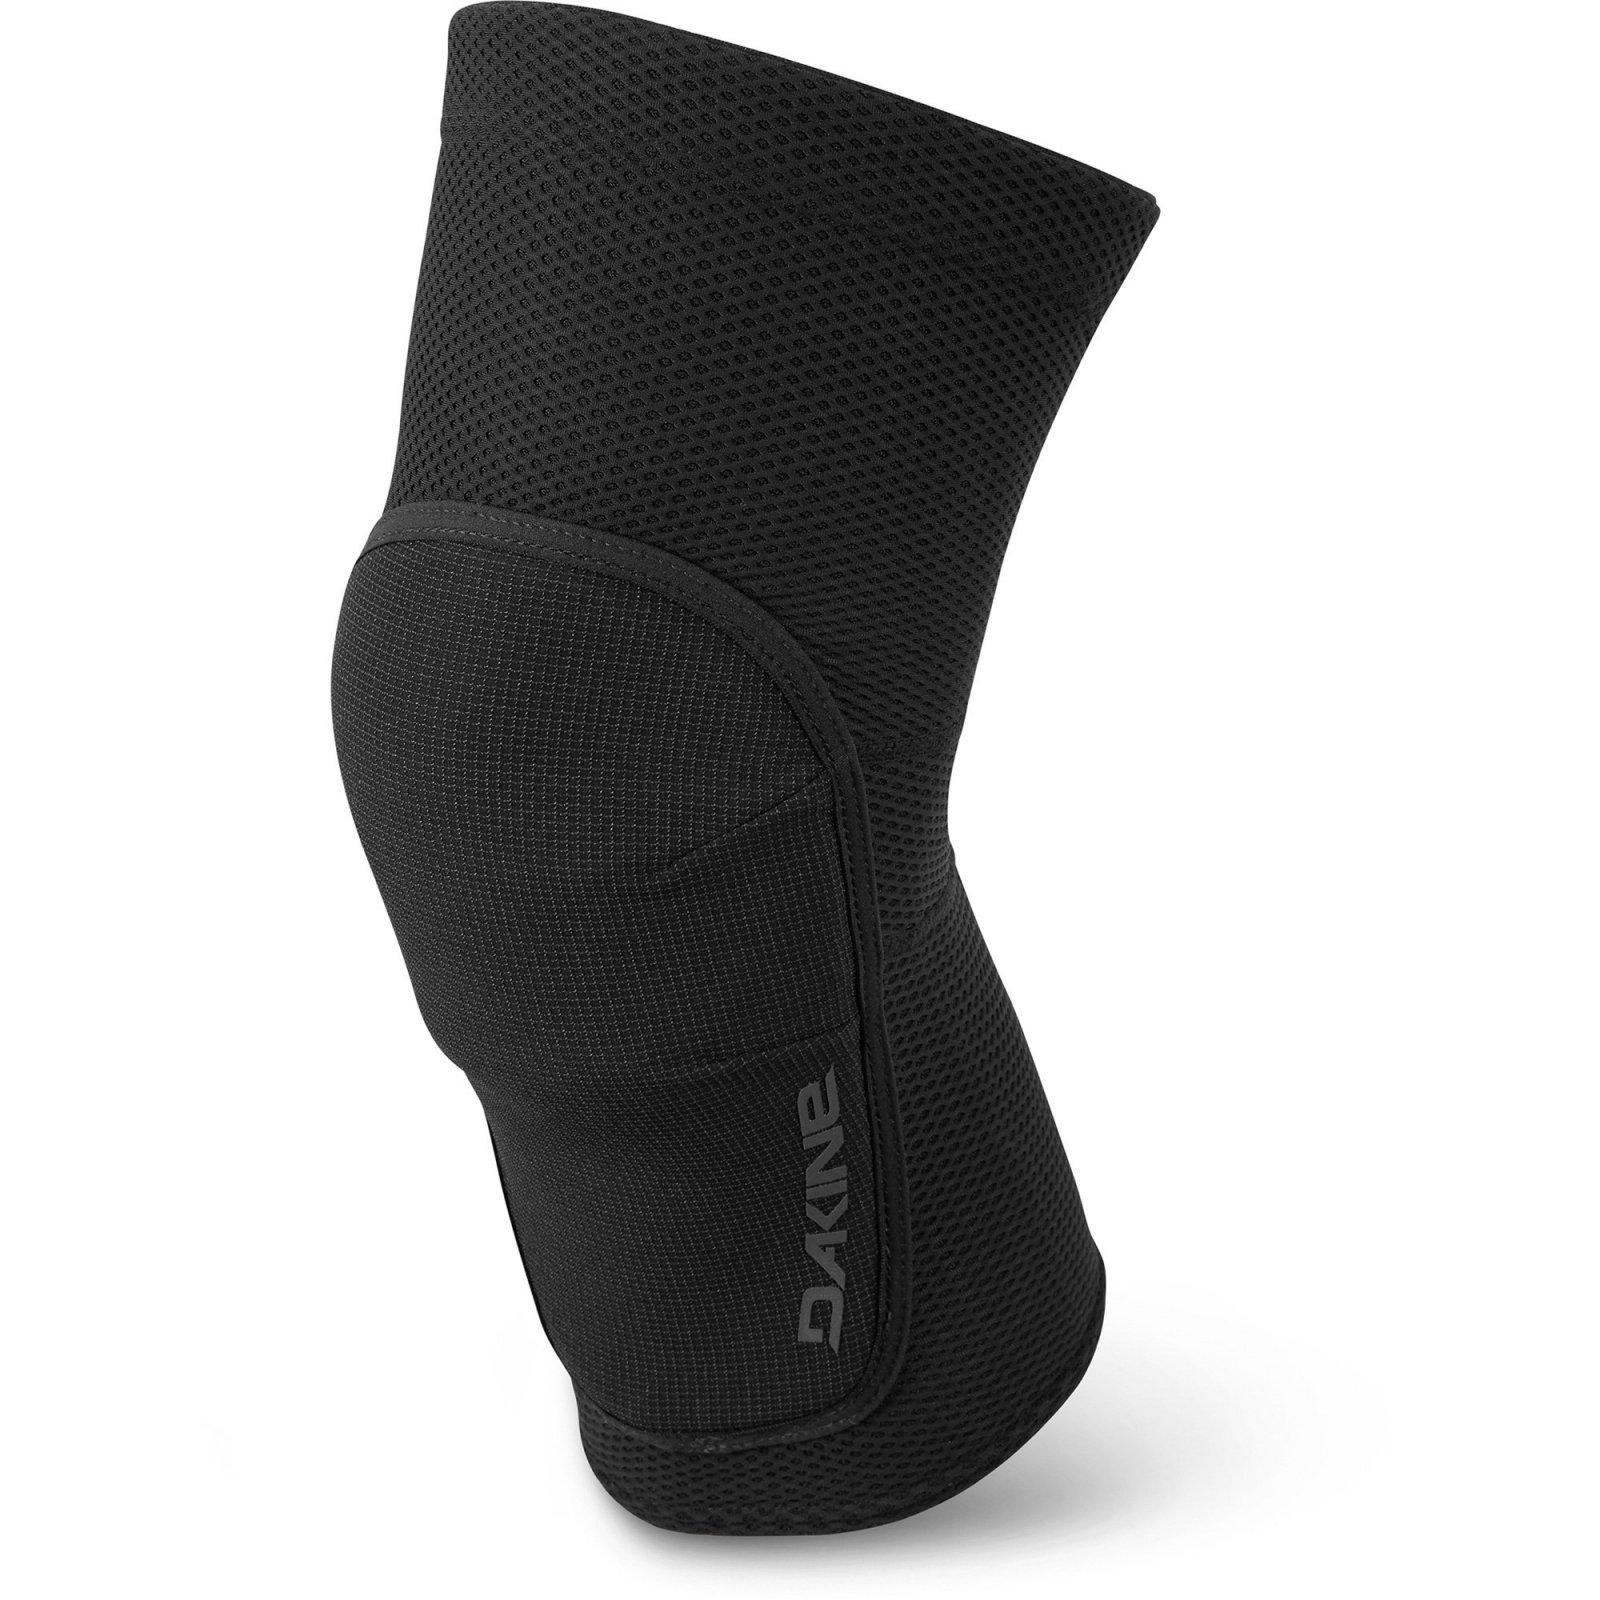 Dakine Slayer Knee Sleeve (Mutliple Size Options)